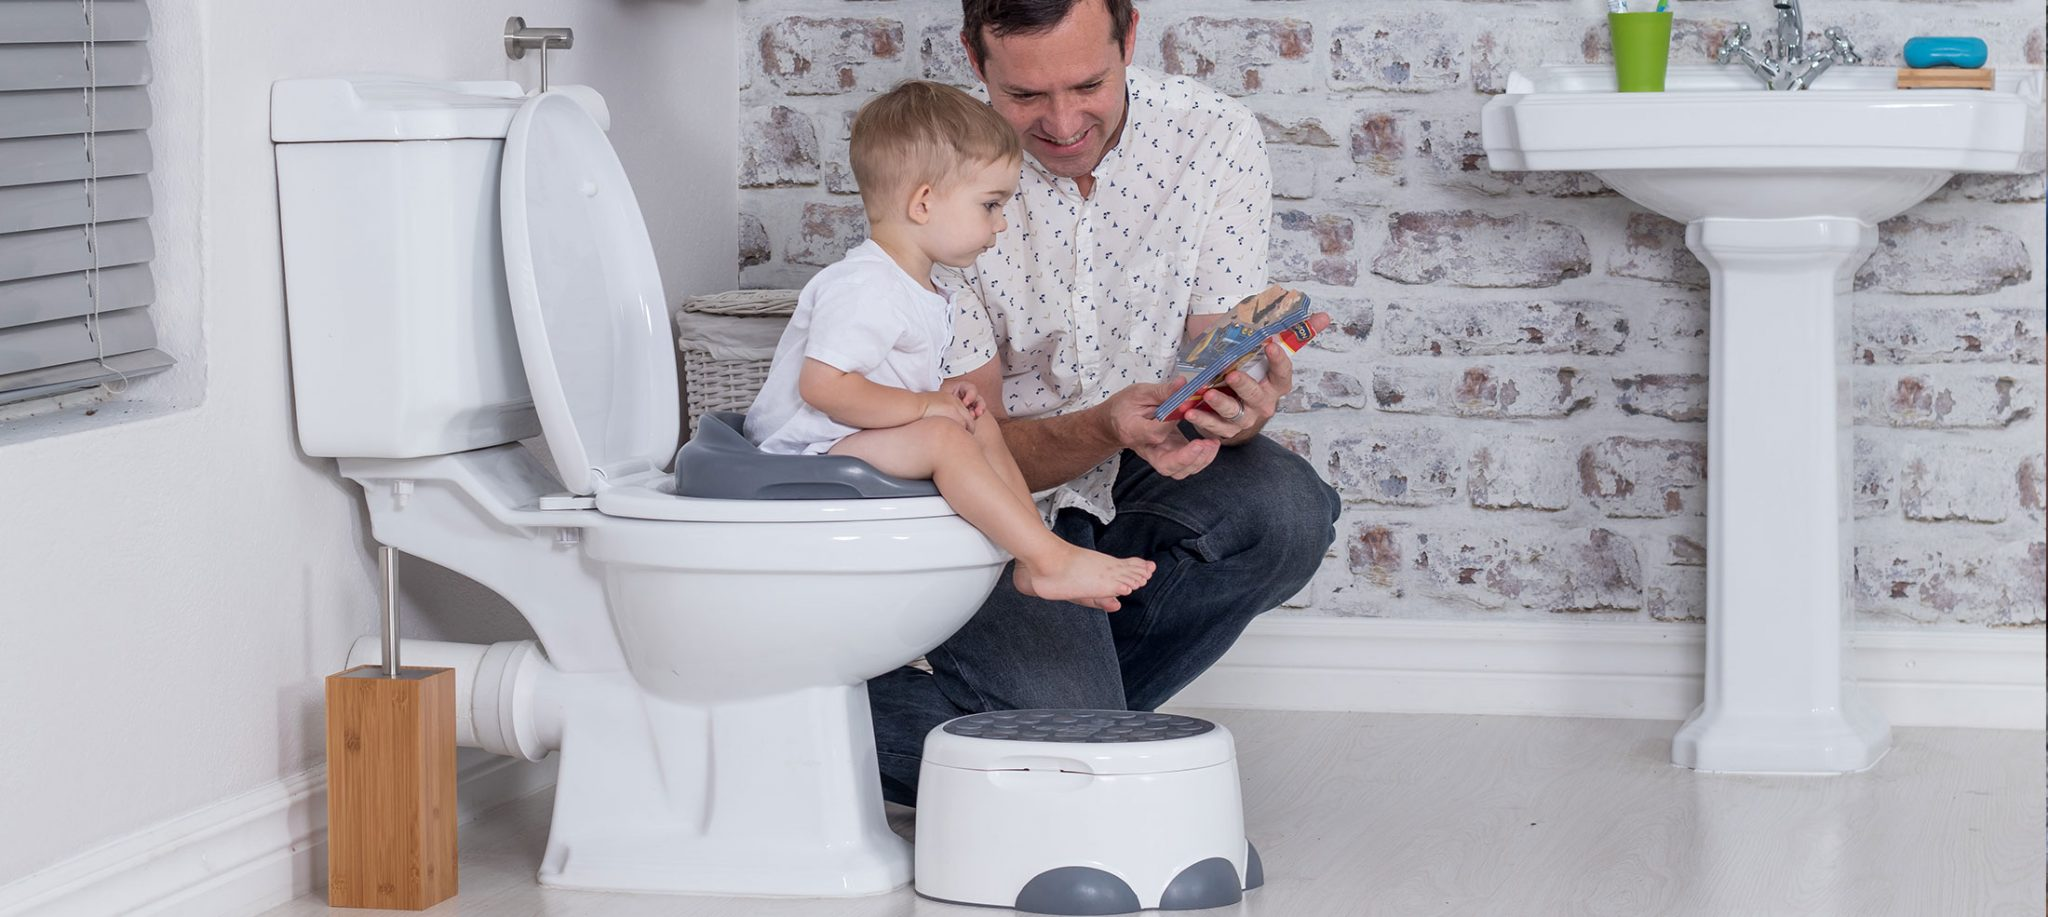 Sensational Bumbo Usa High Quality Infant And Toddler Products Creativecarmelina Interior Chair Design Creativecarmelinacom